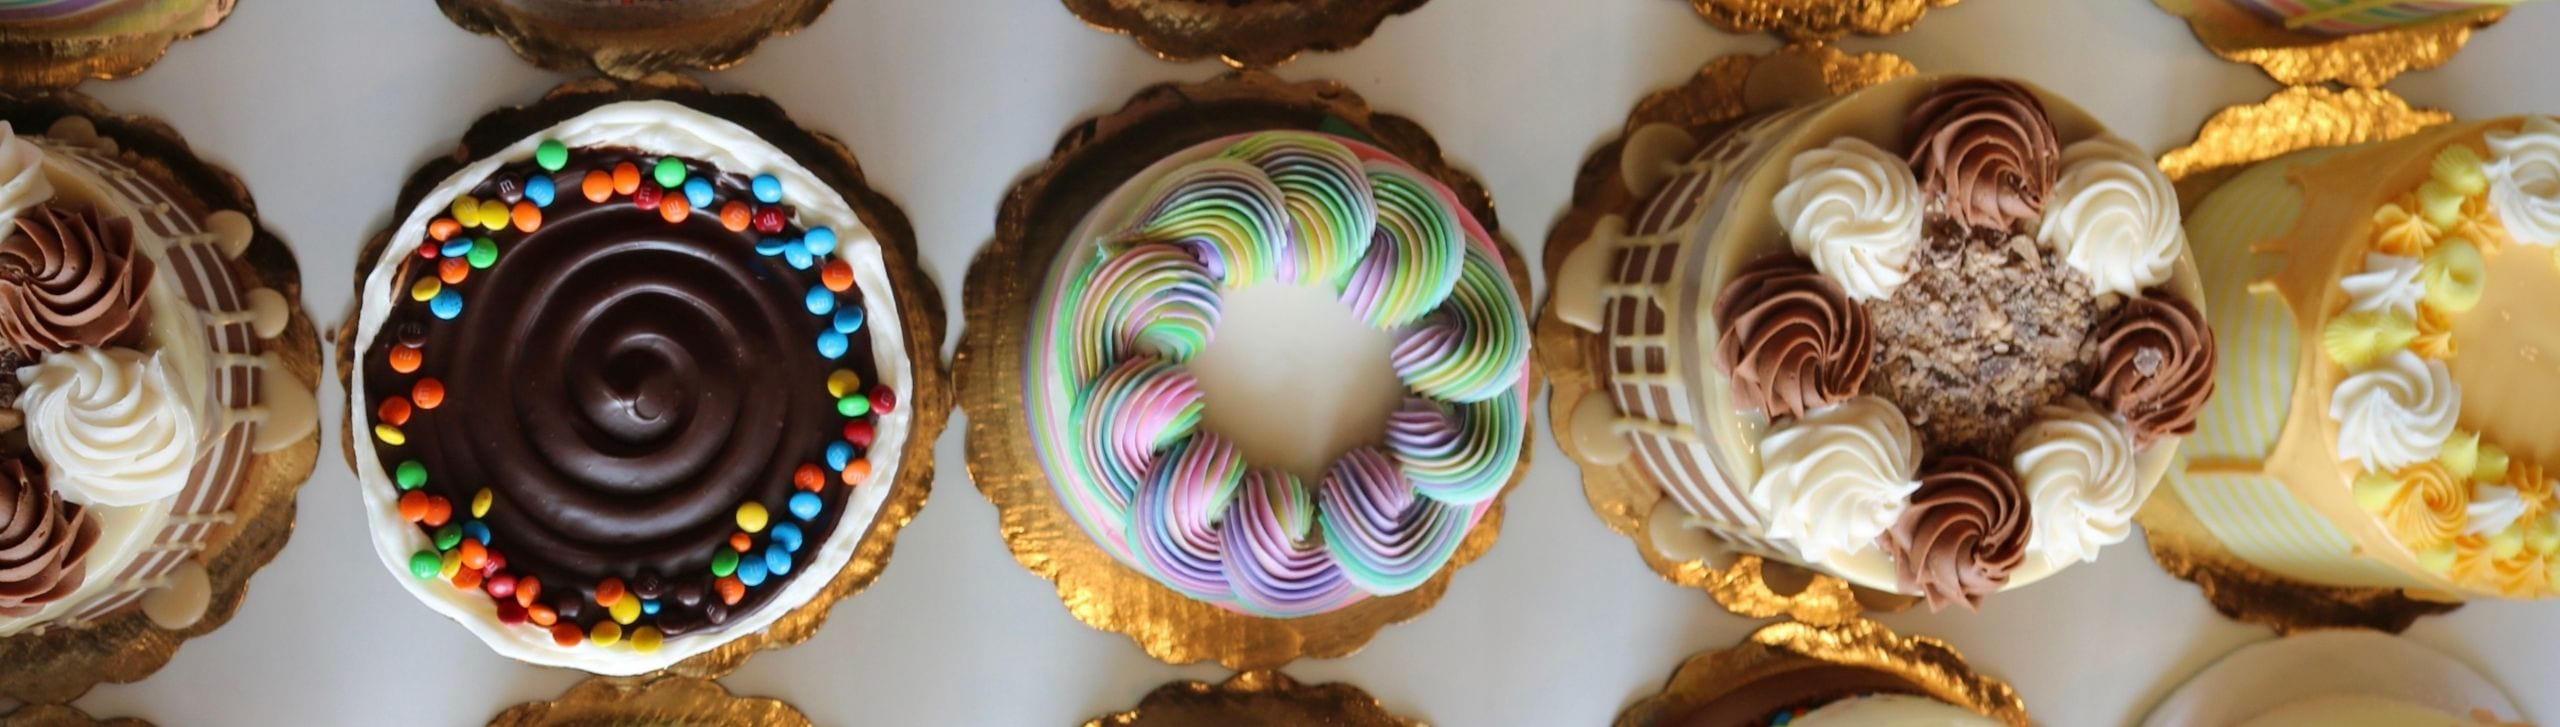 Store Cakes | 3 Sweet Girls Cakery